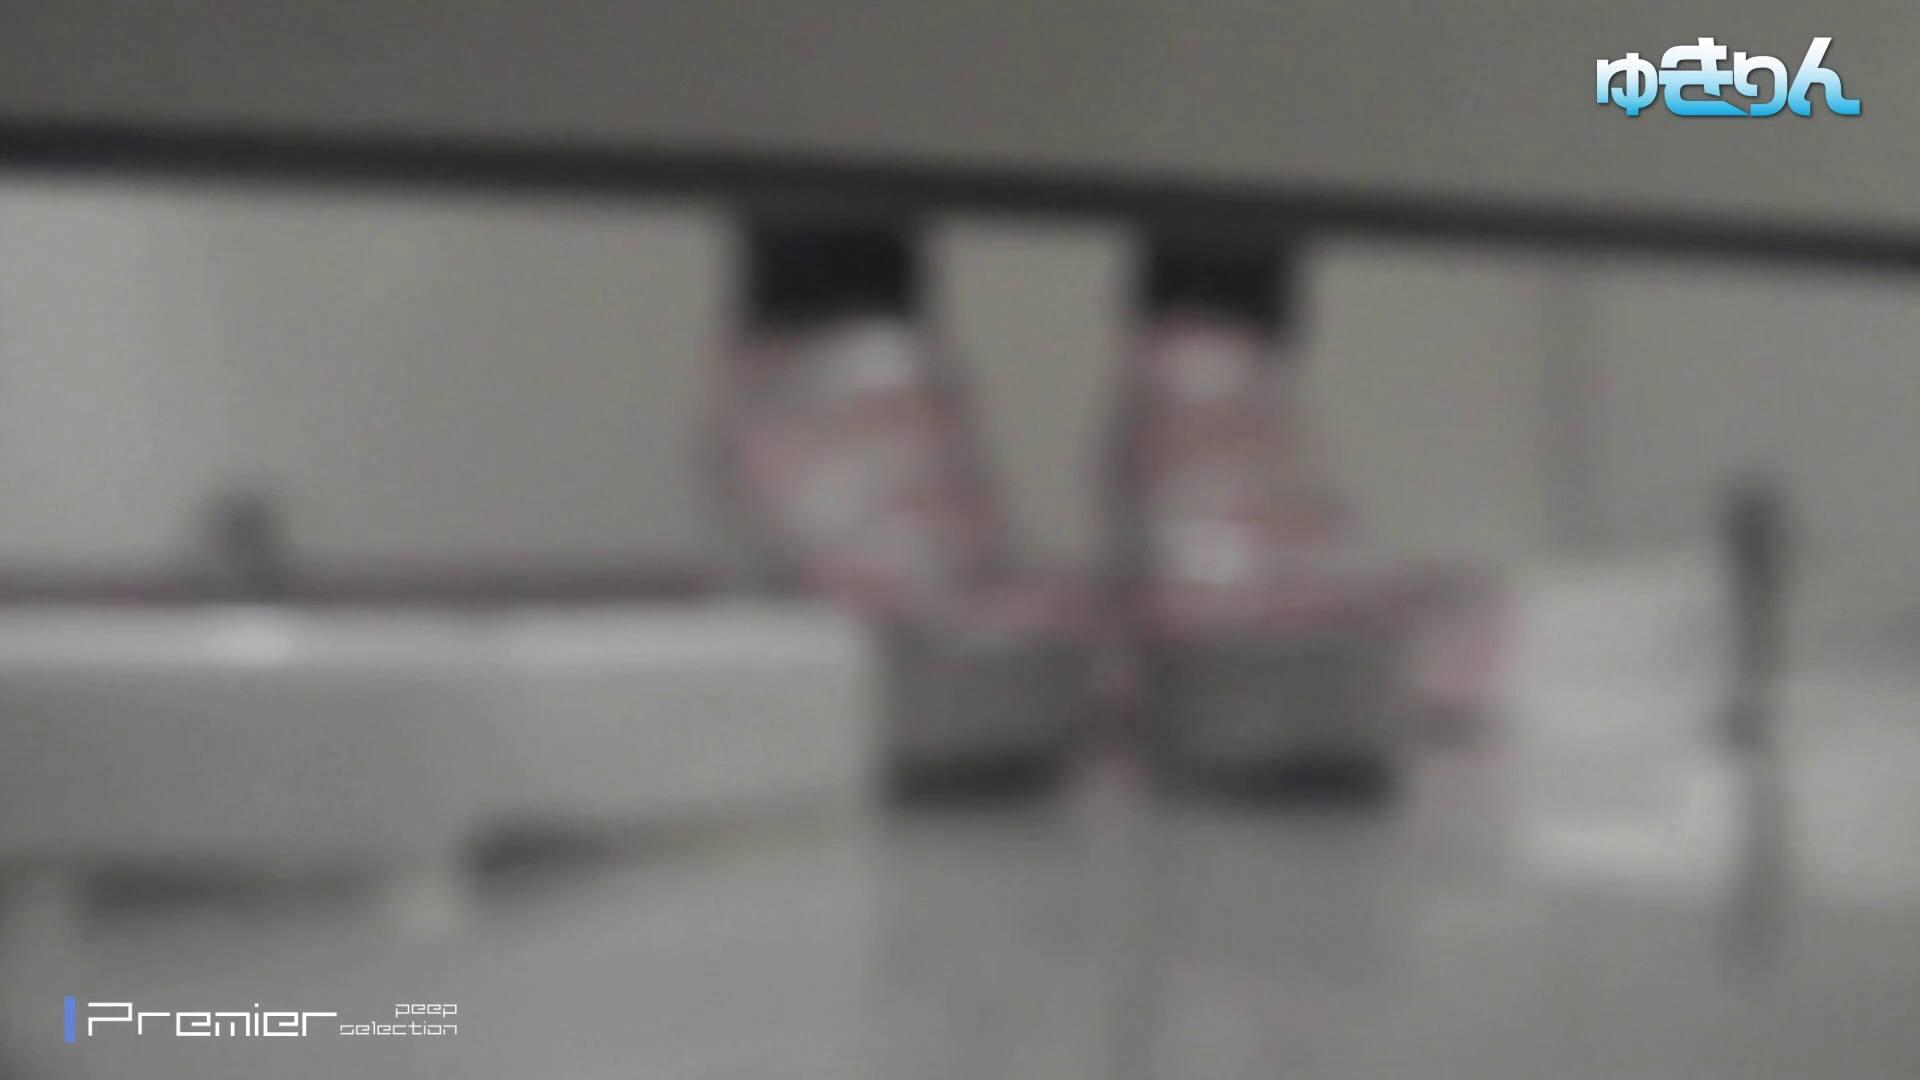 cm友達同士三人グループの二人を同時に捕獲【新世界の射窓からNo120】 むっちりガール オマンコ無修正動画無料 80枚 31